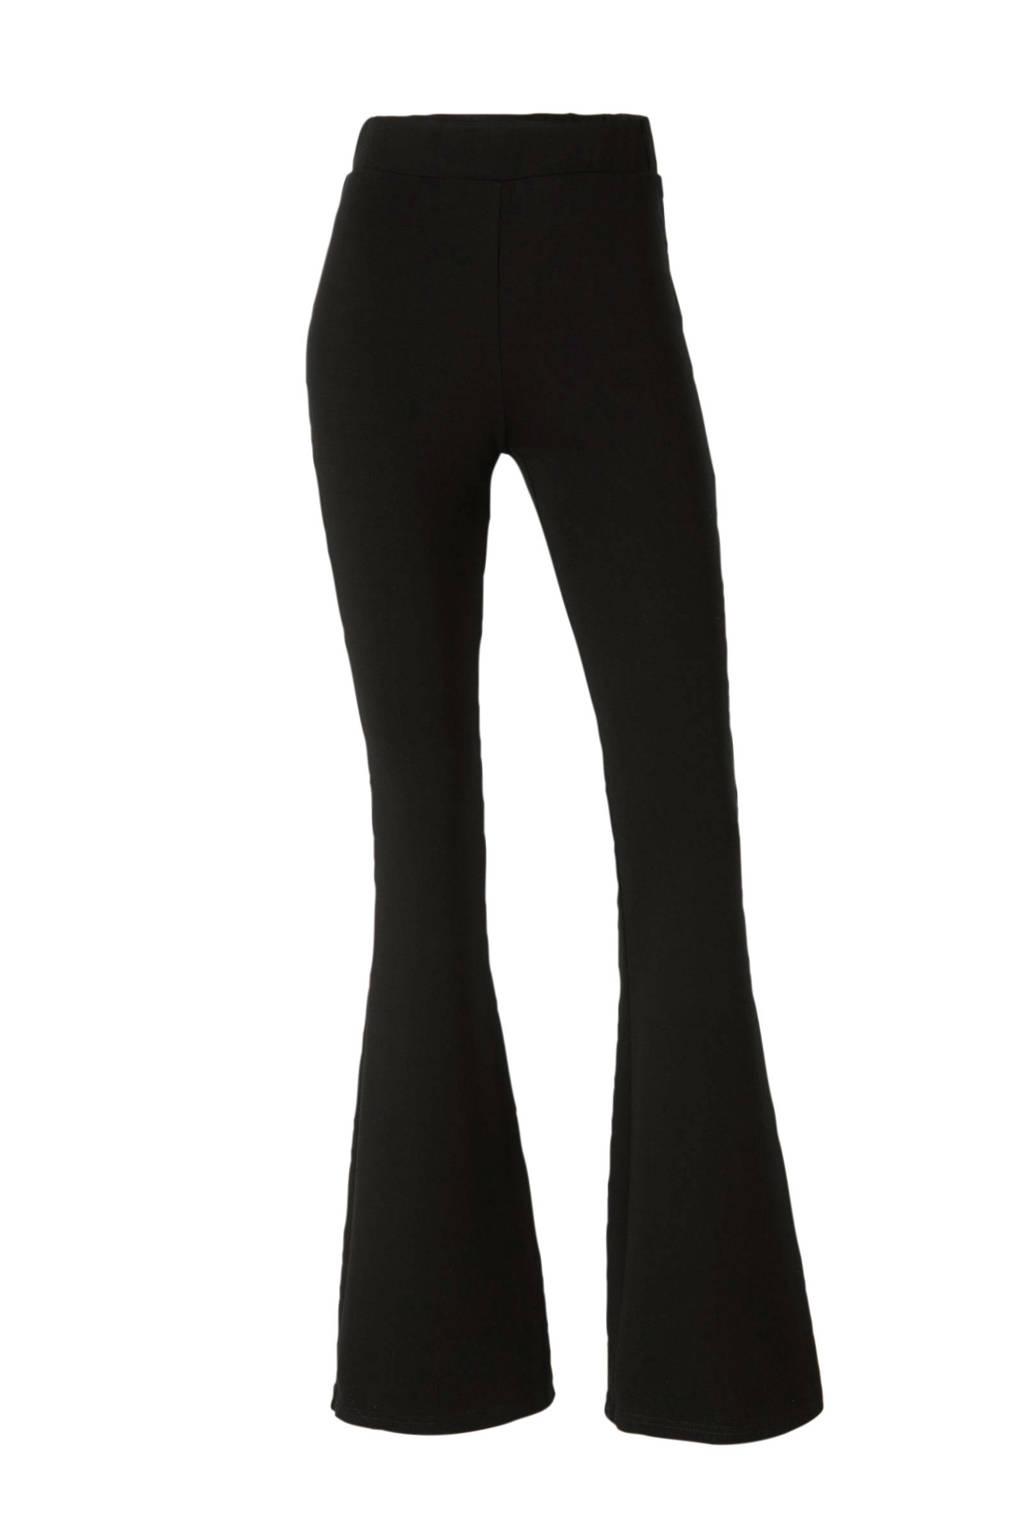 NA-KD flared legging zwart, Zwart